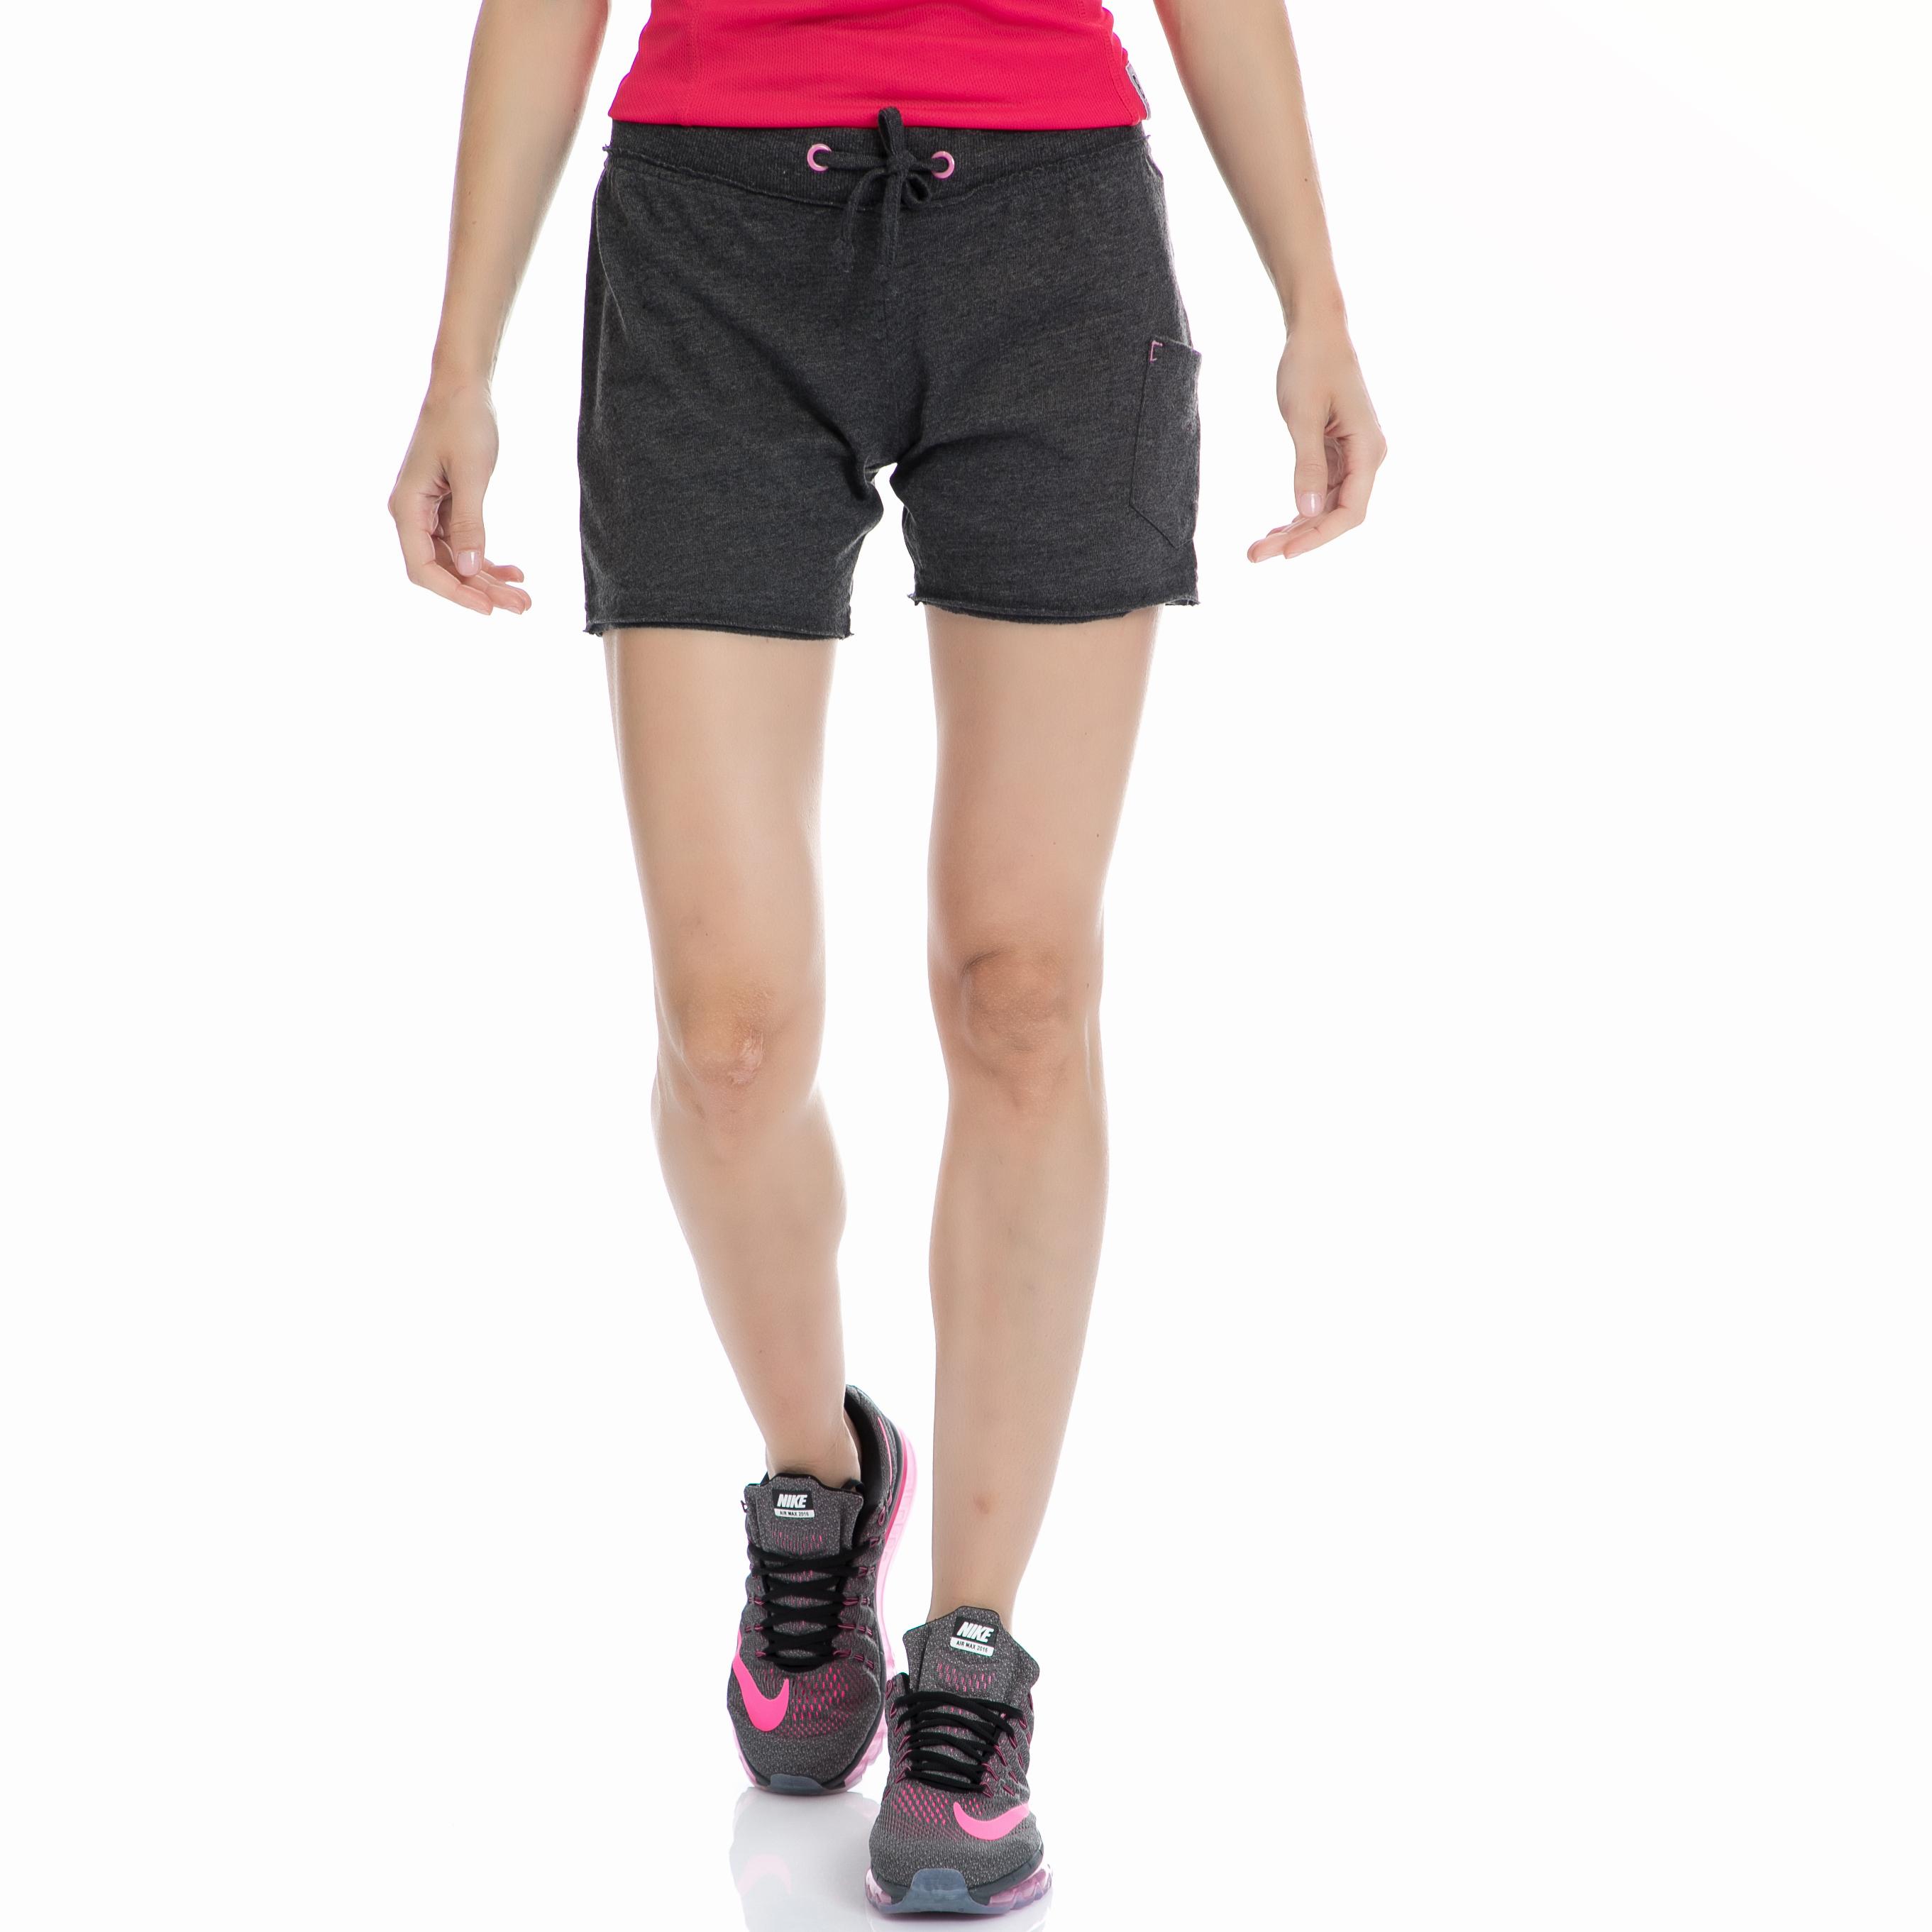 BODYTALK - Γυαναικείο σορτς BODYTALK μαύρο-γκρι γυναικεία ρούχα σορτς βερμούδες αθλητικά